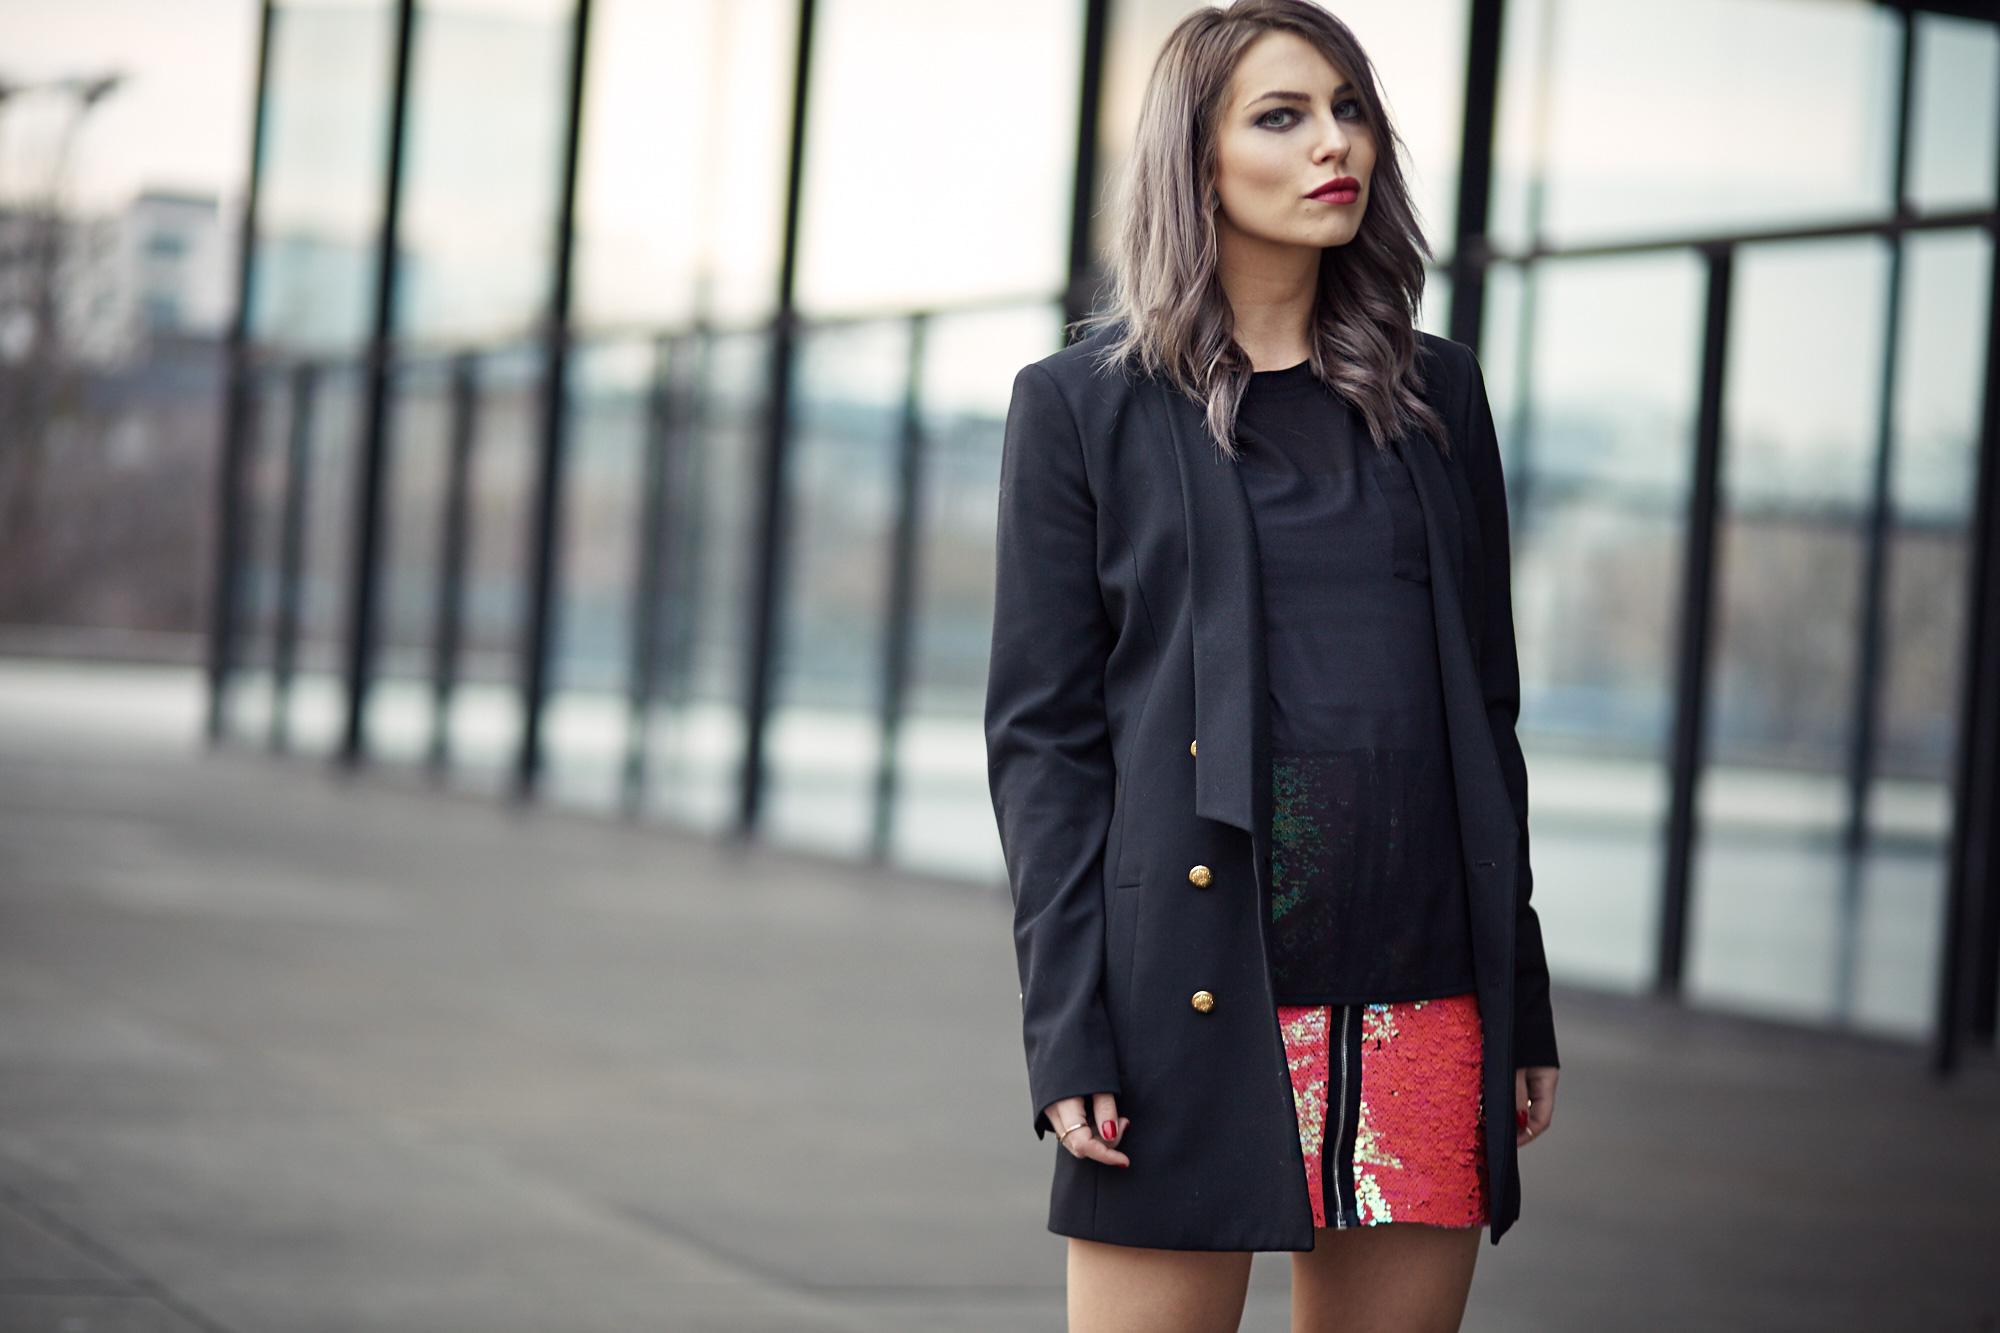 Sequins & Black